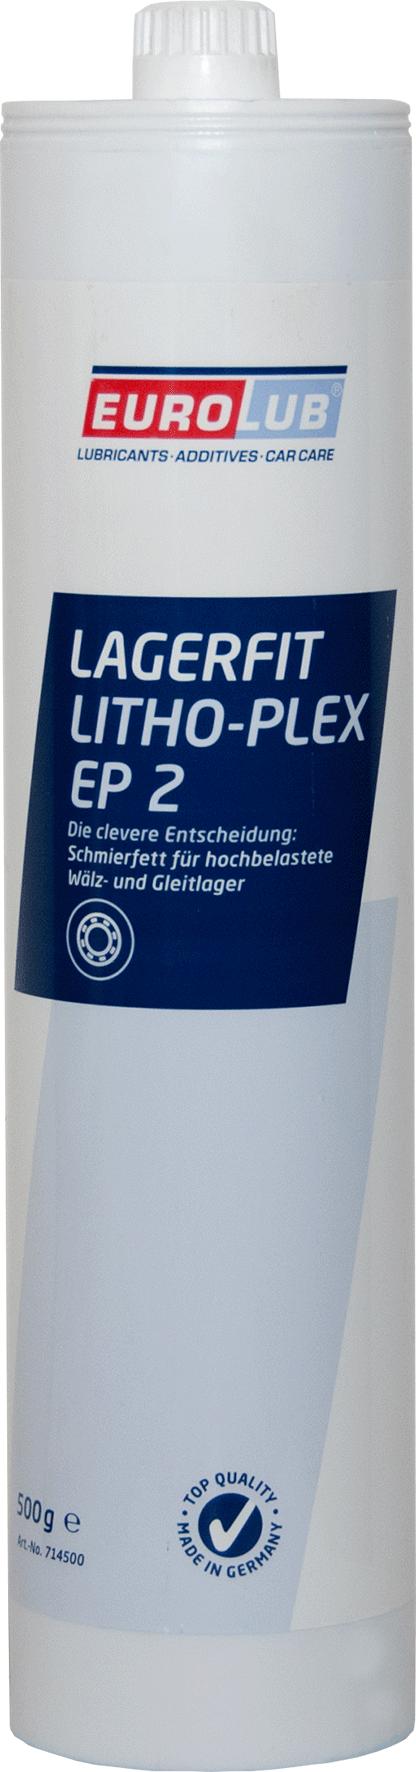 EUROLUB Lagerfit Lithoplex EP 2 (литиевая смазка, c повышеной рабочей температурой), 0.5л